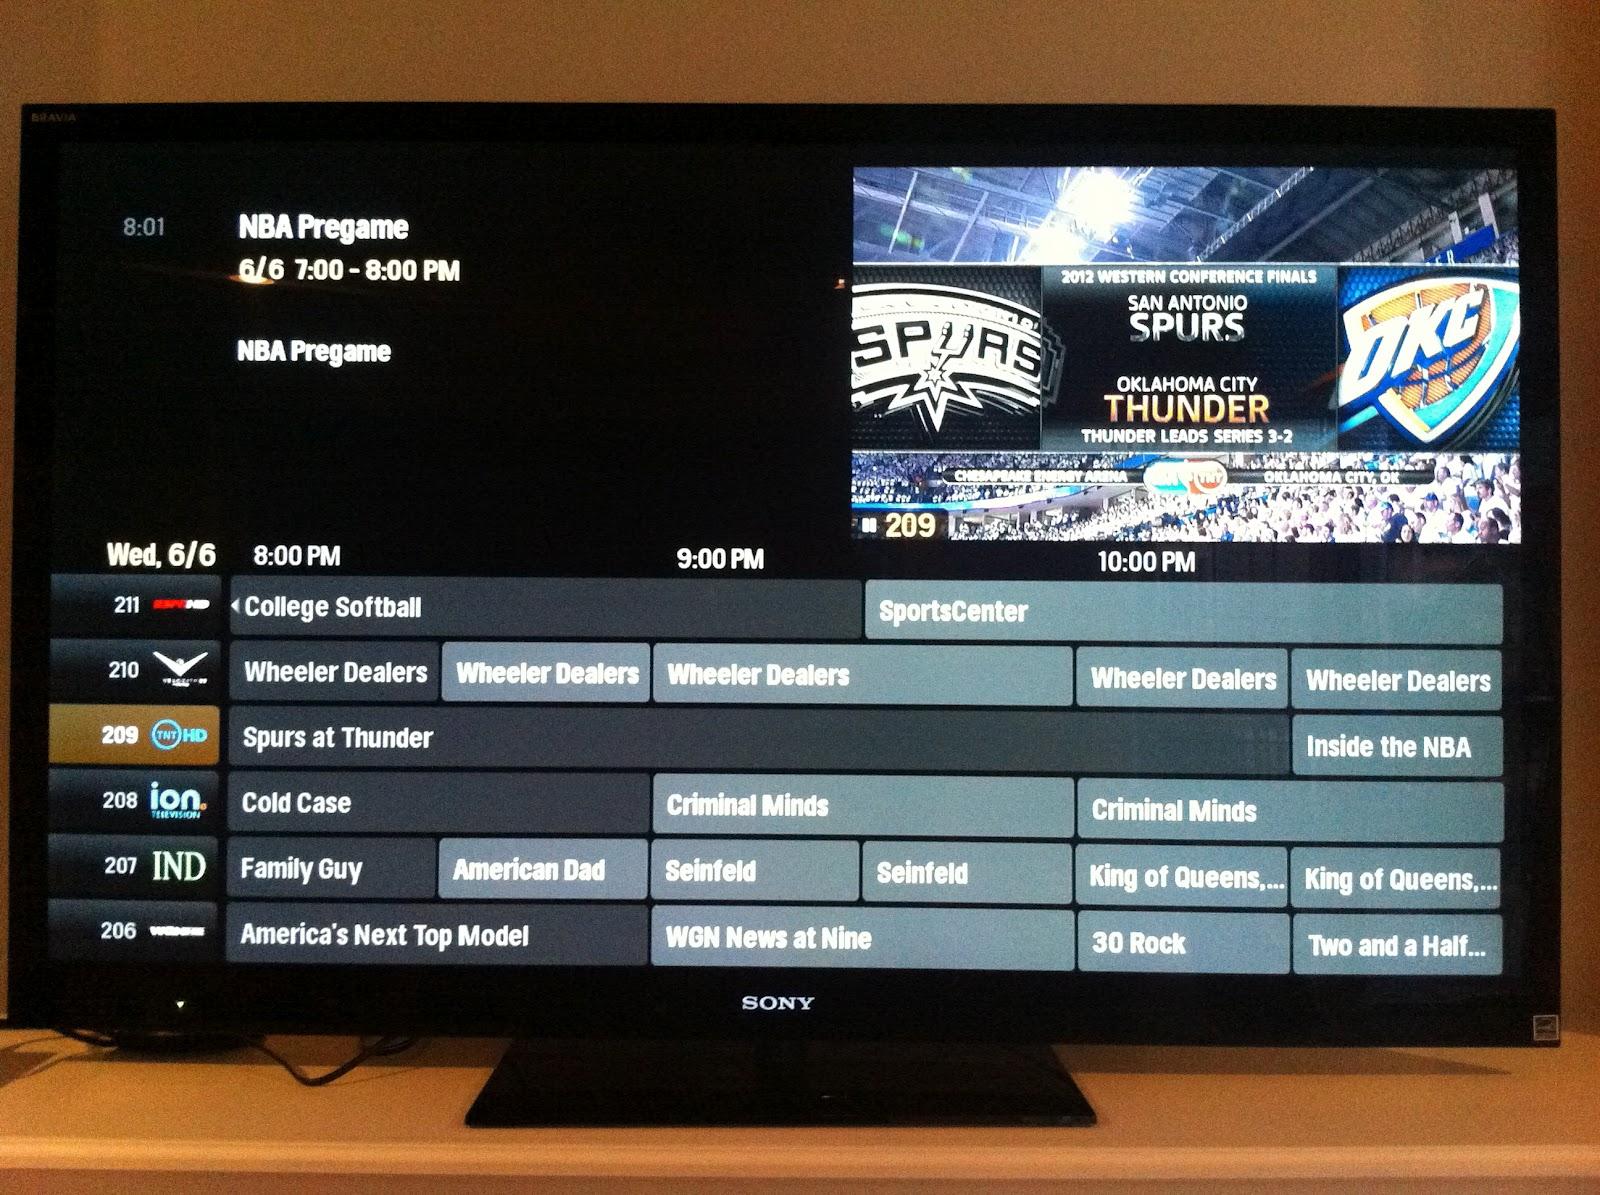 Direct Tv Dodge Ram Radio Wiring Diagram Review Wow Ultra Vs Directv Hr34 Genie All Apple